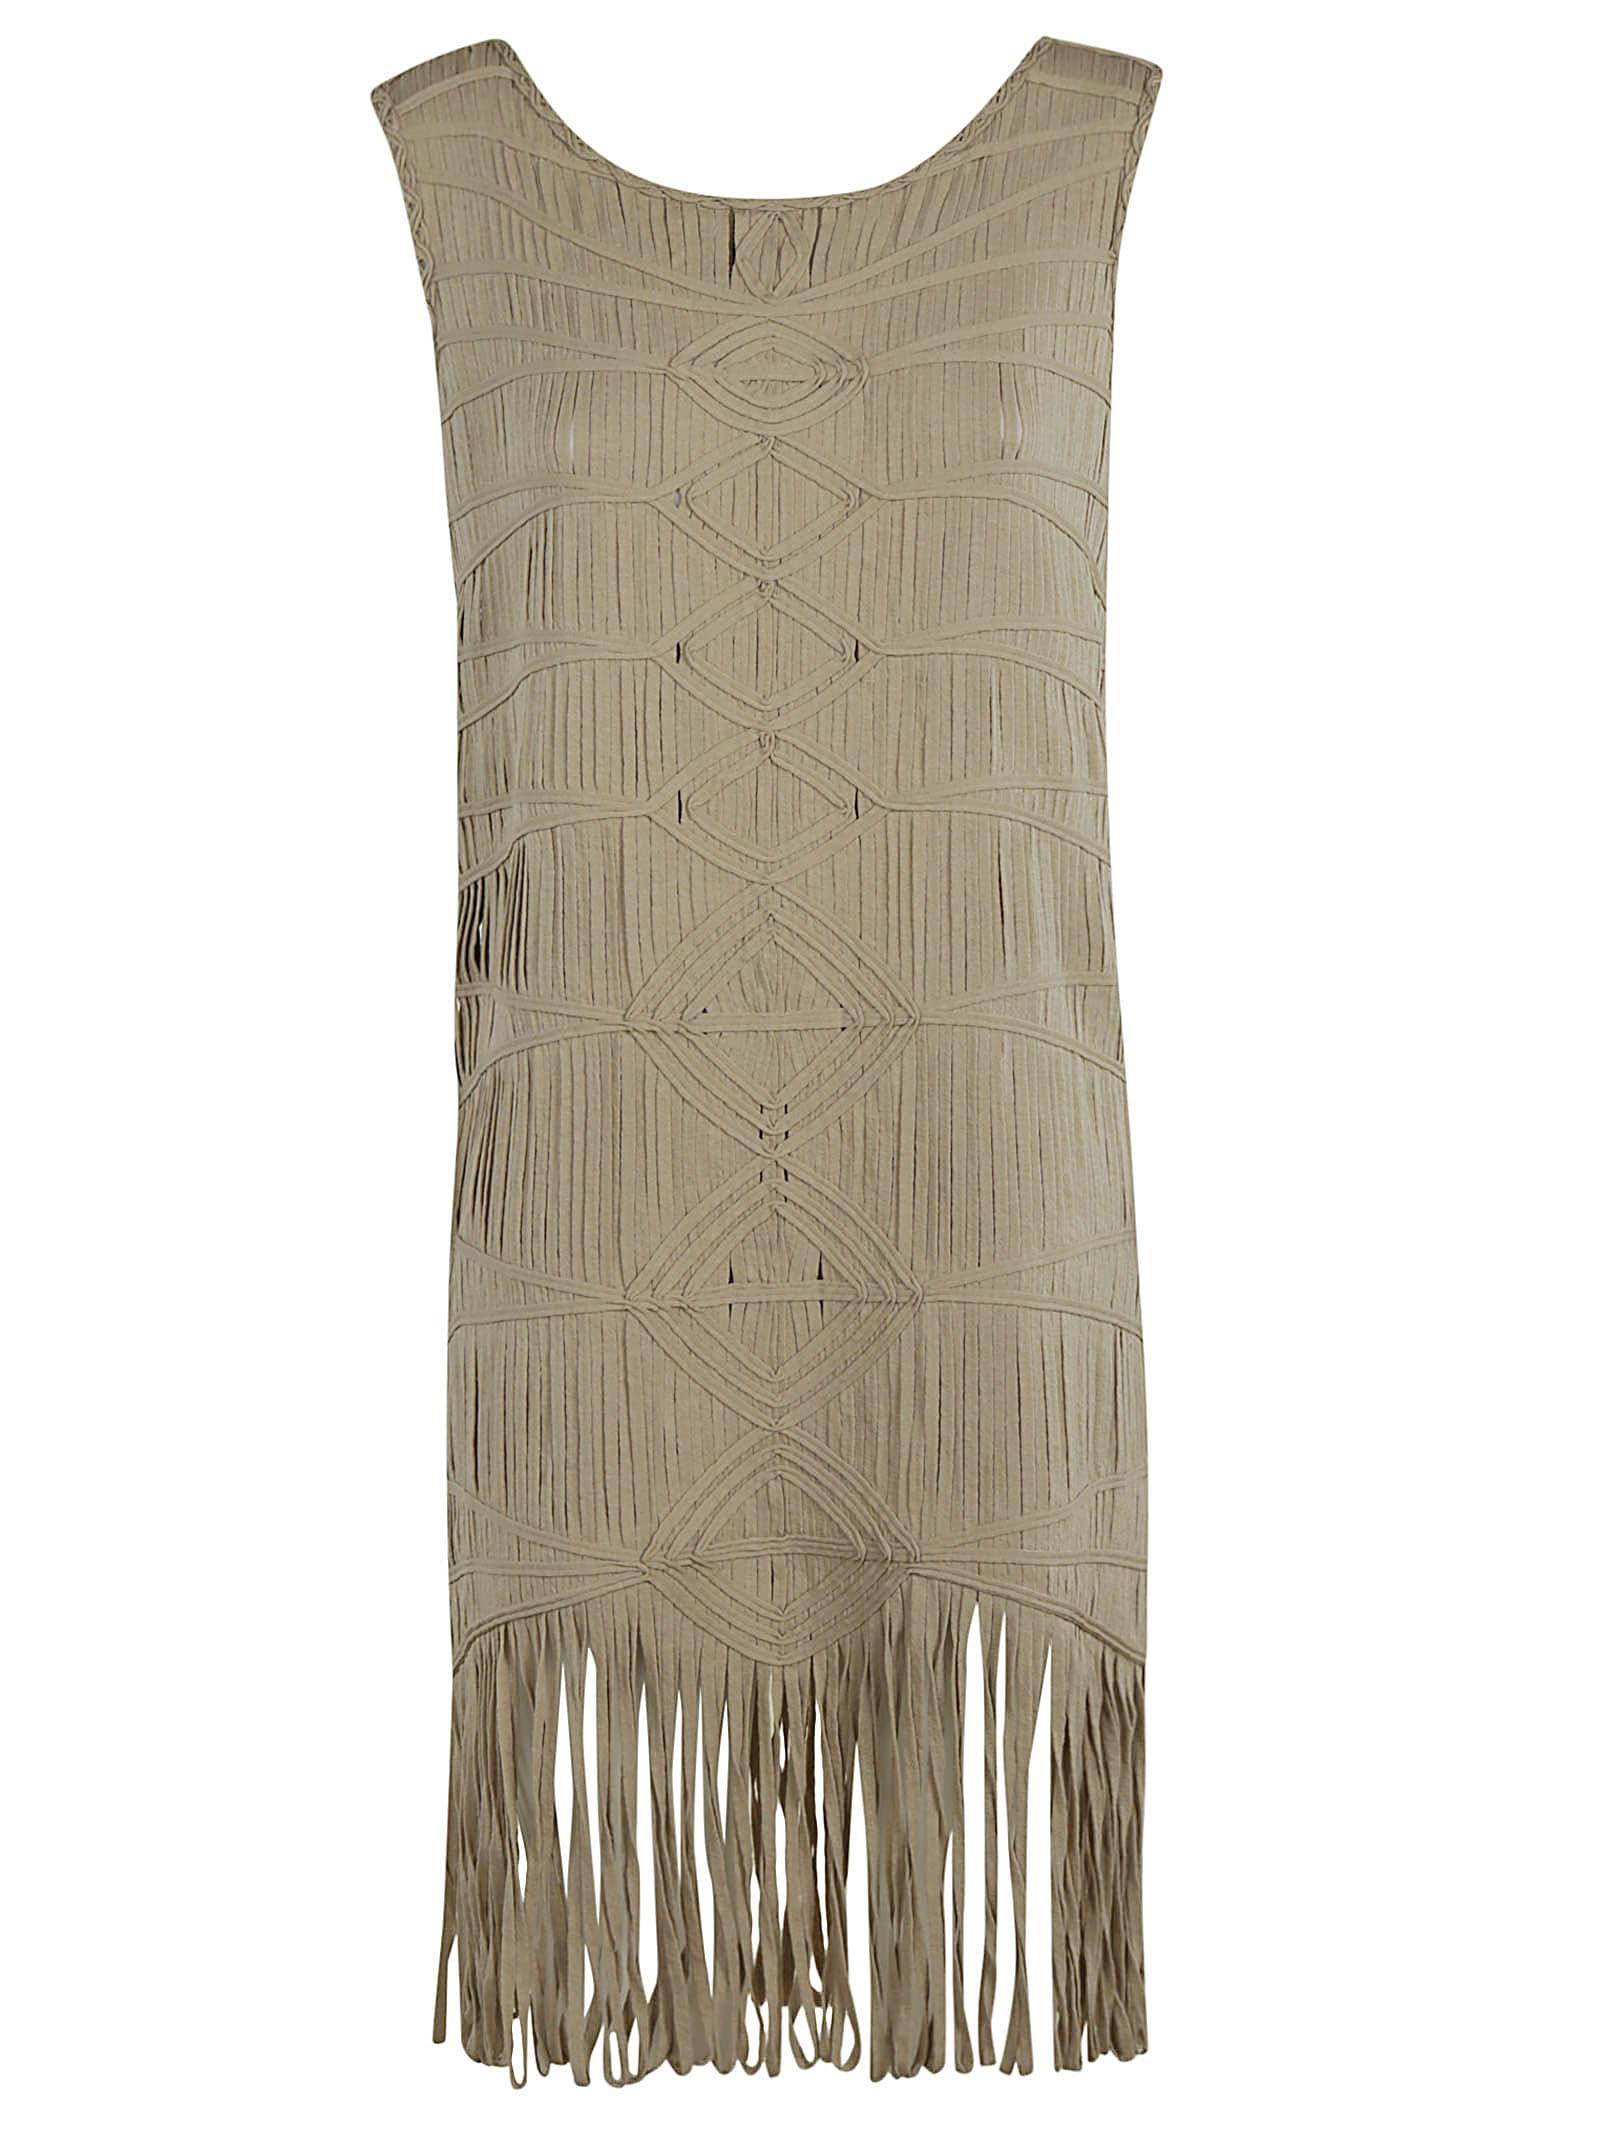 Buy Blumarine Tassel Detail Sleeveless Dress online, shop Blumarine with free shipping